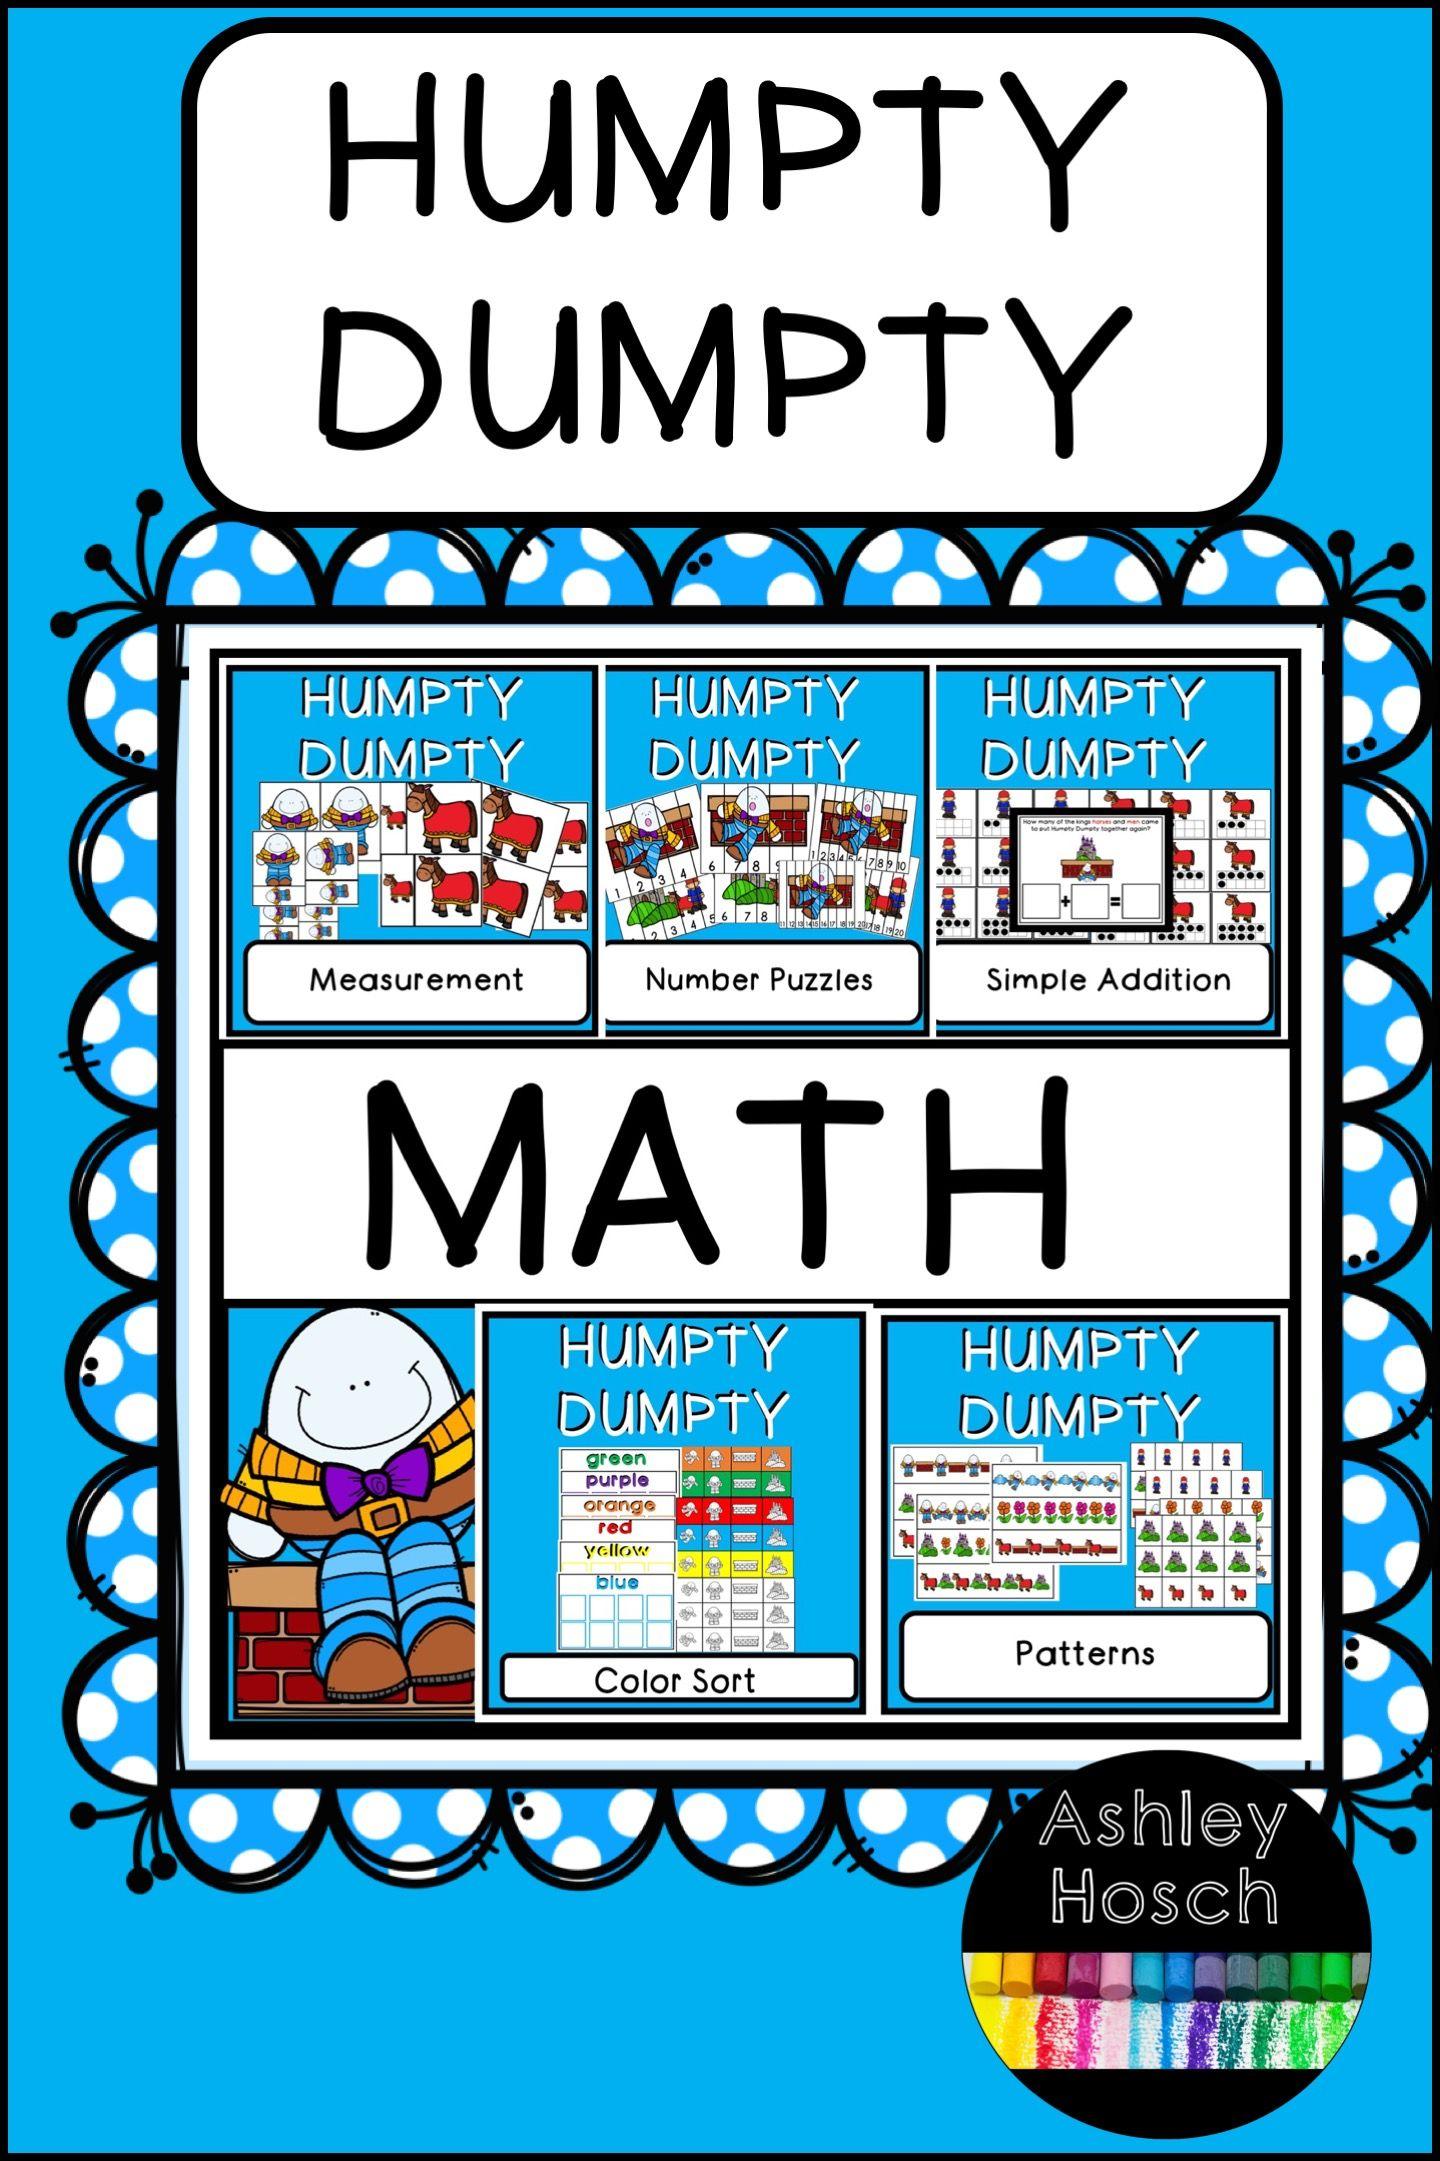 Humpty Dumpty Thematic Math Activities For Preschool